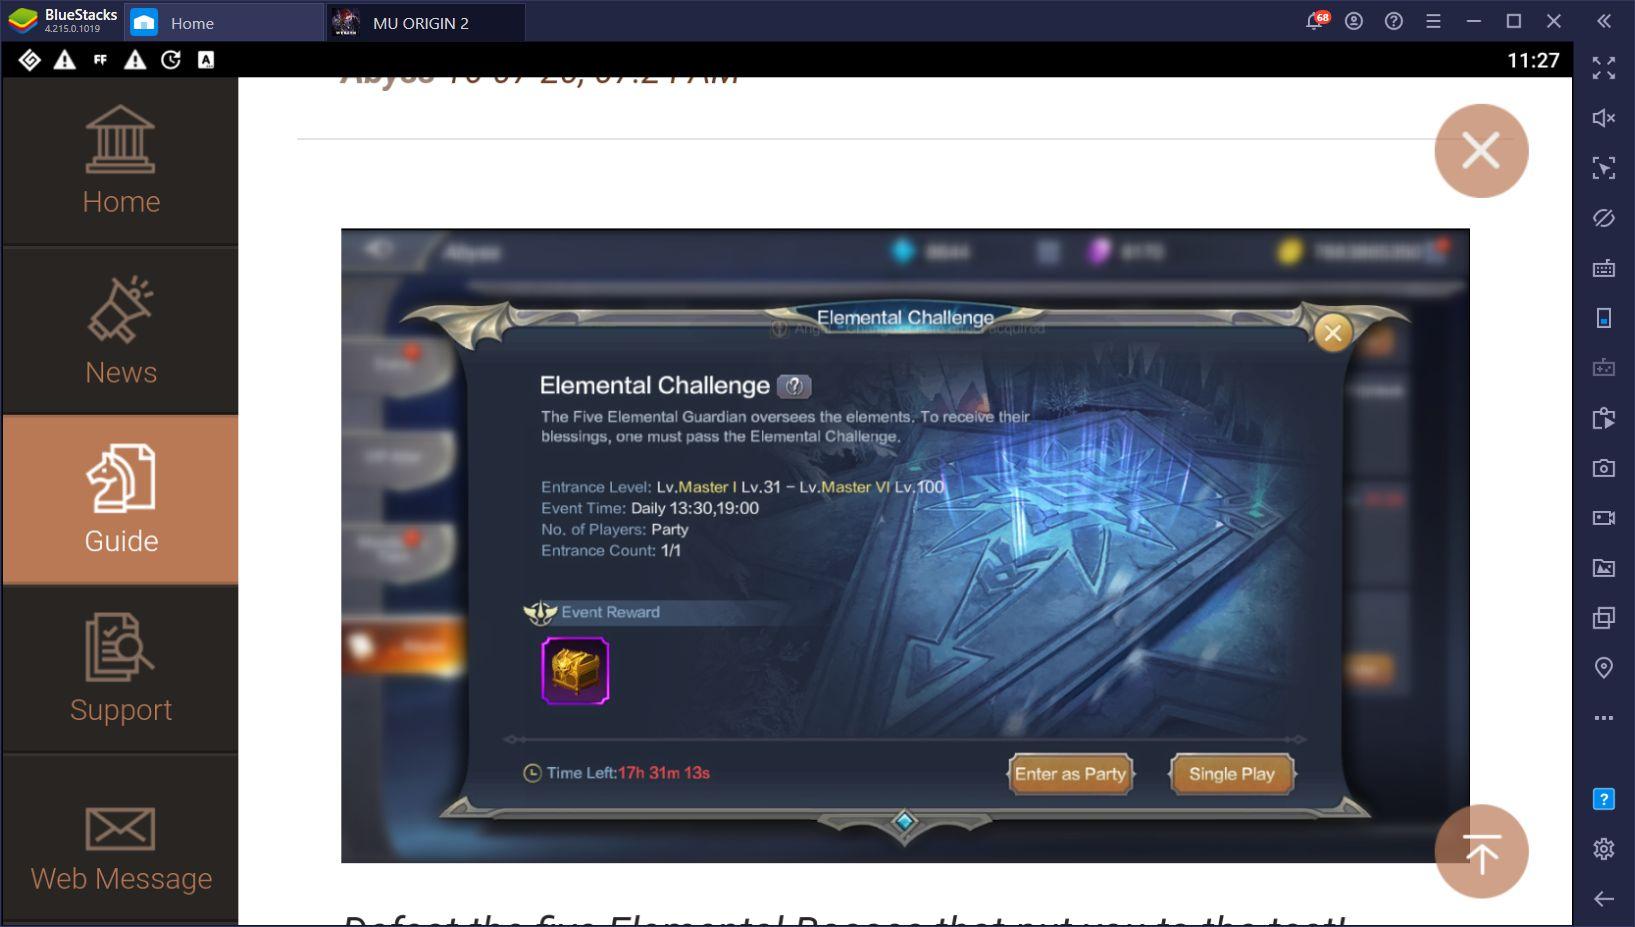 MU ORIGIN 2 Elemental Update – New Elemental Combat and Pet Upgrade Systems